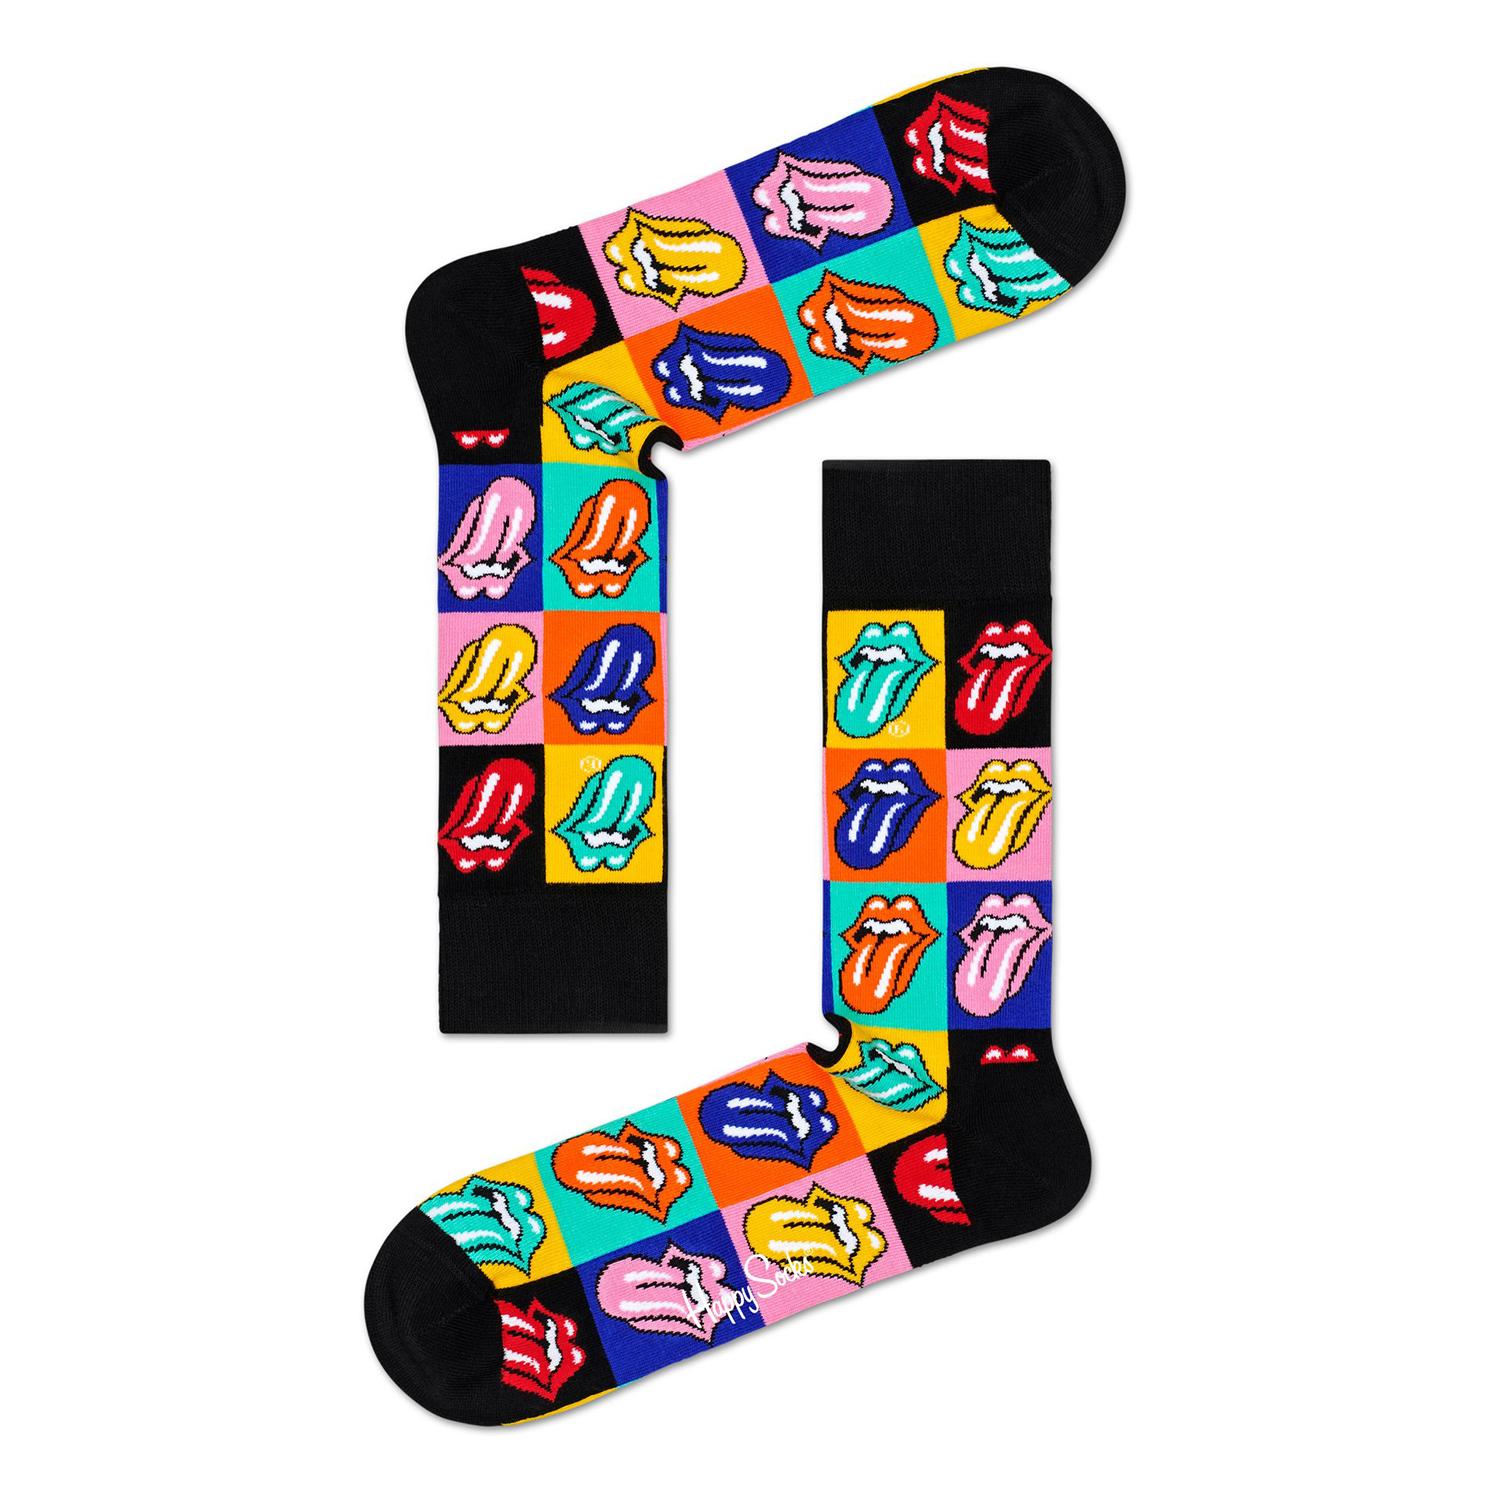 Happy Socks – The Rolling Stones Jumpin Jack Flash Sock